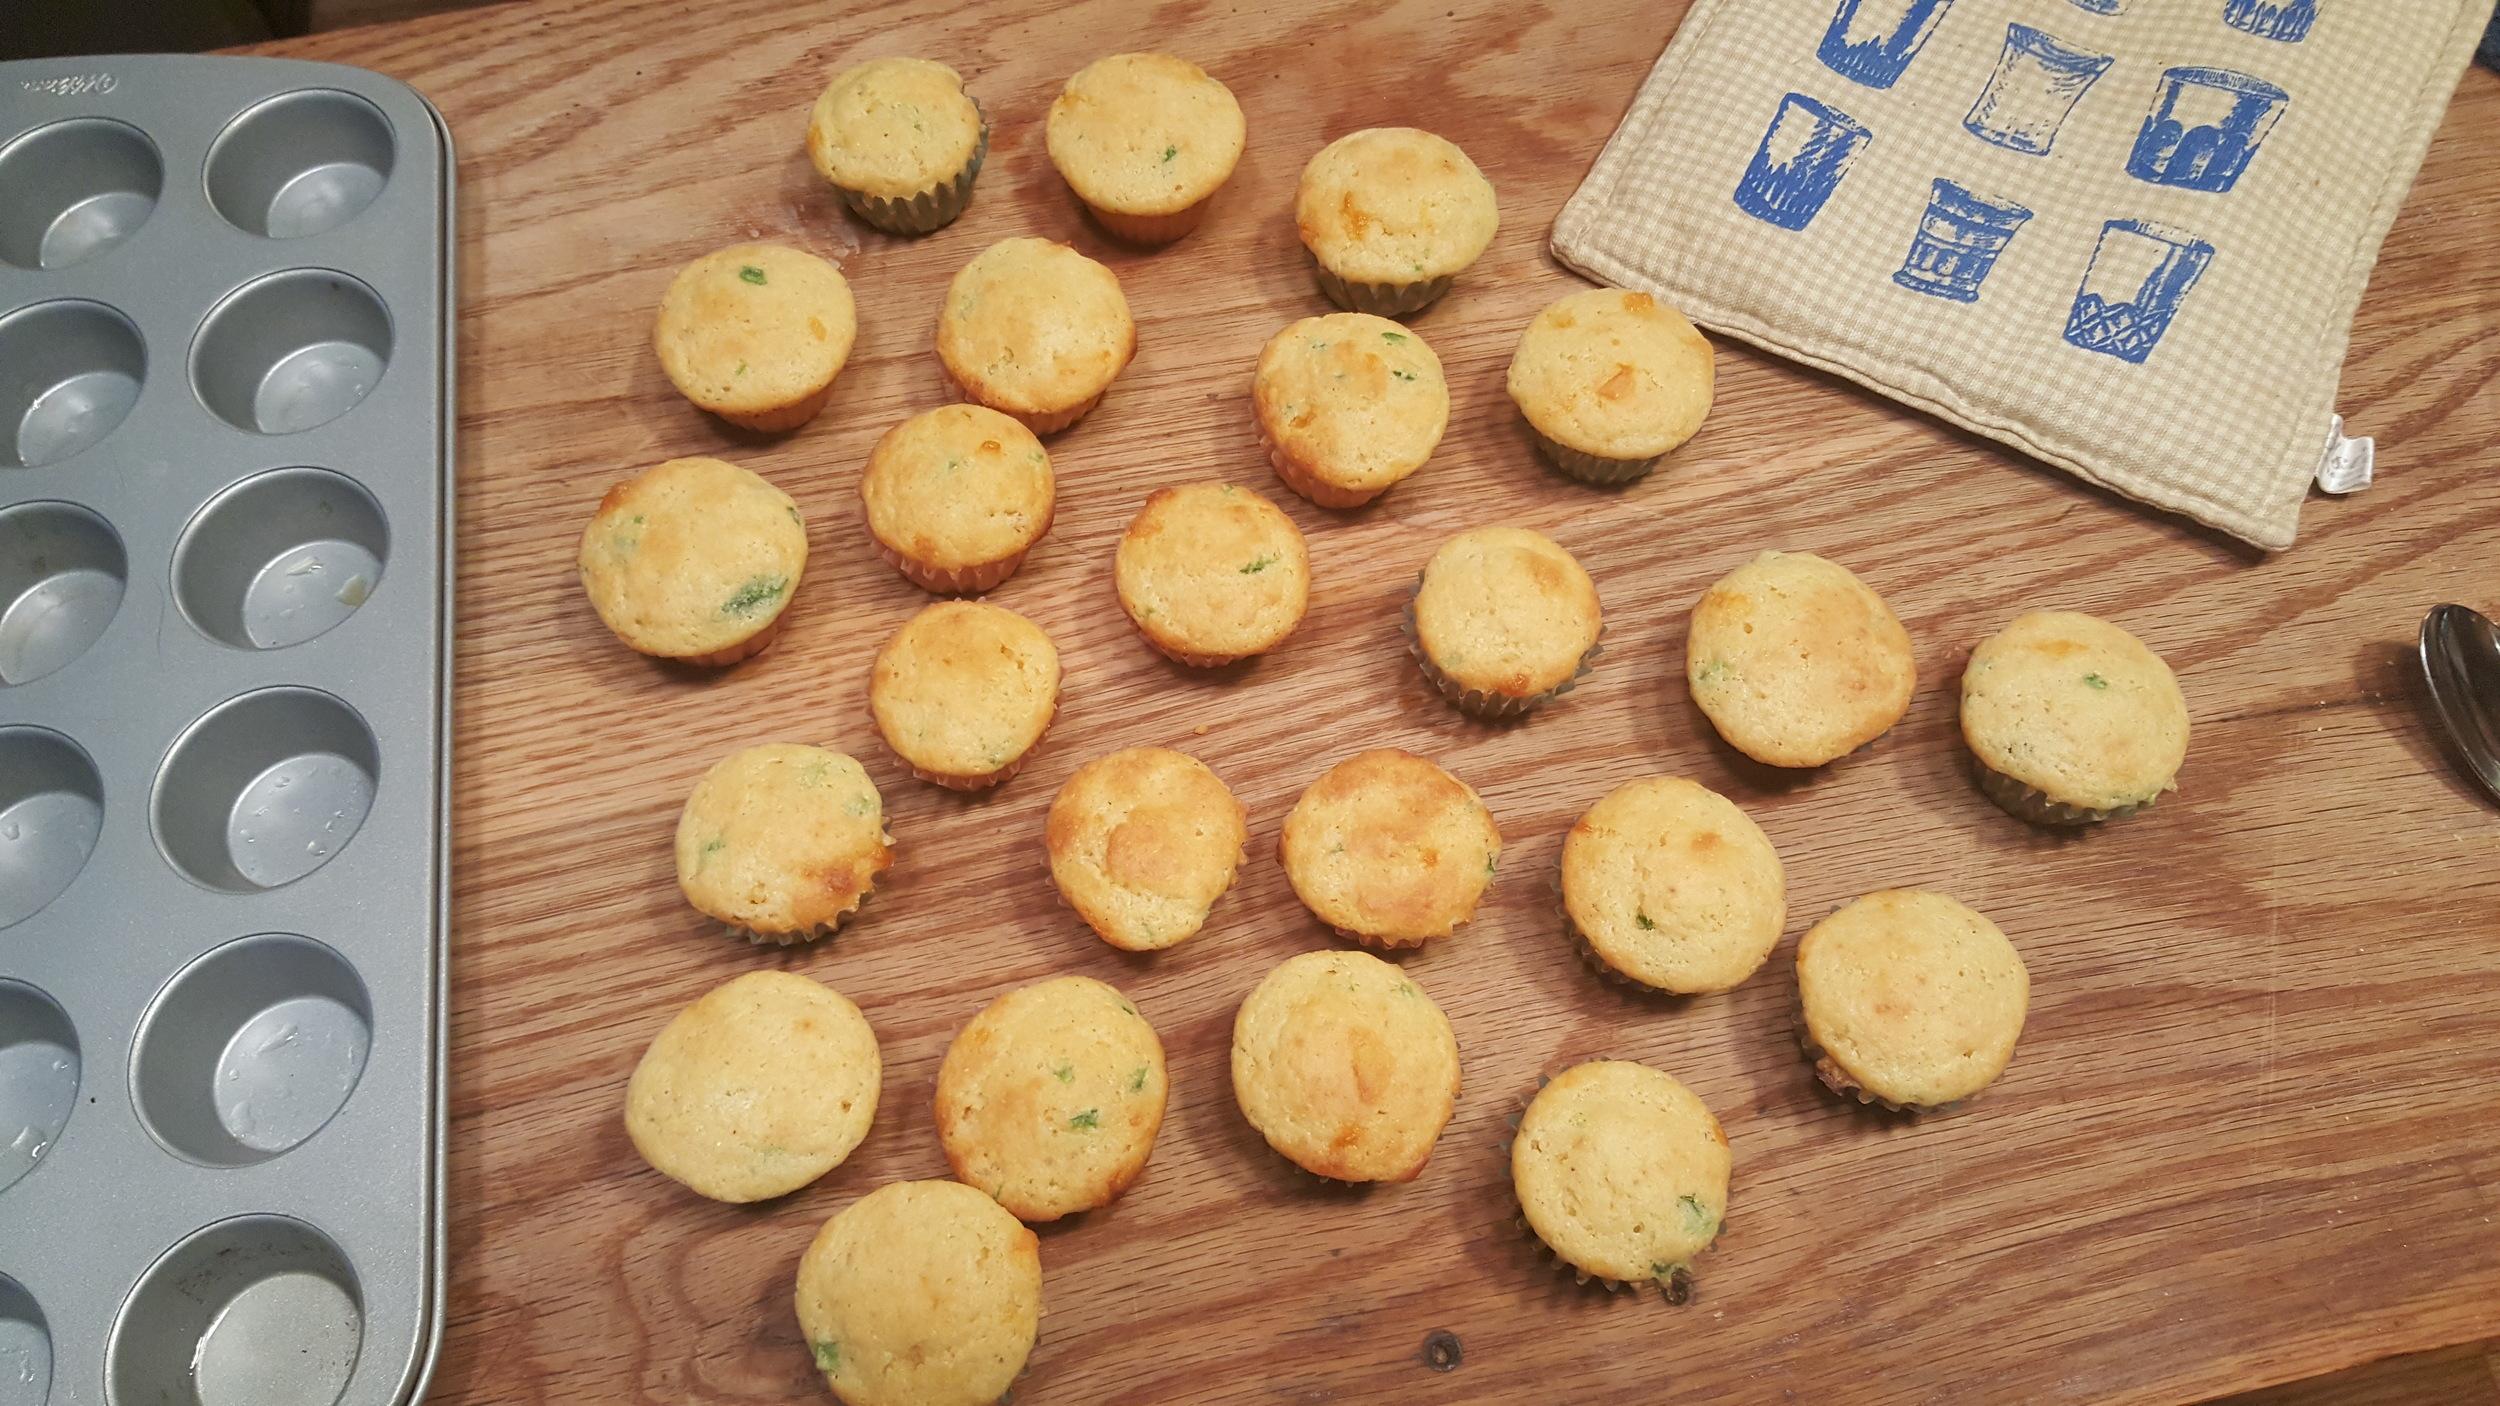 jalapeno-cheddar-cornbread.jpg